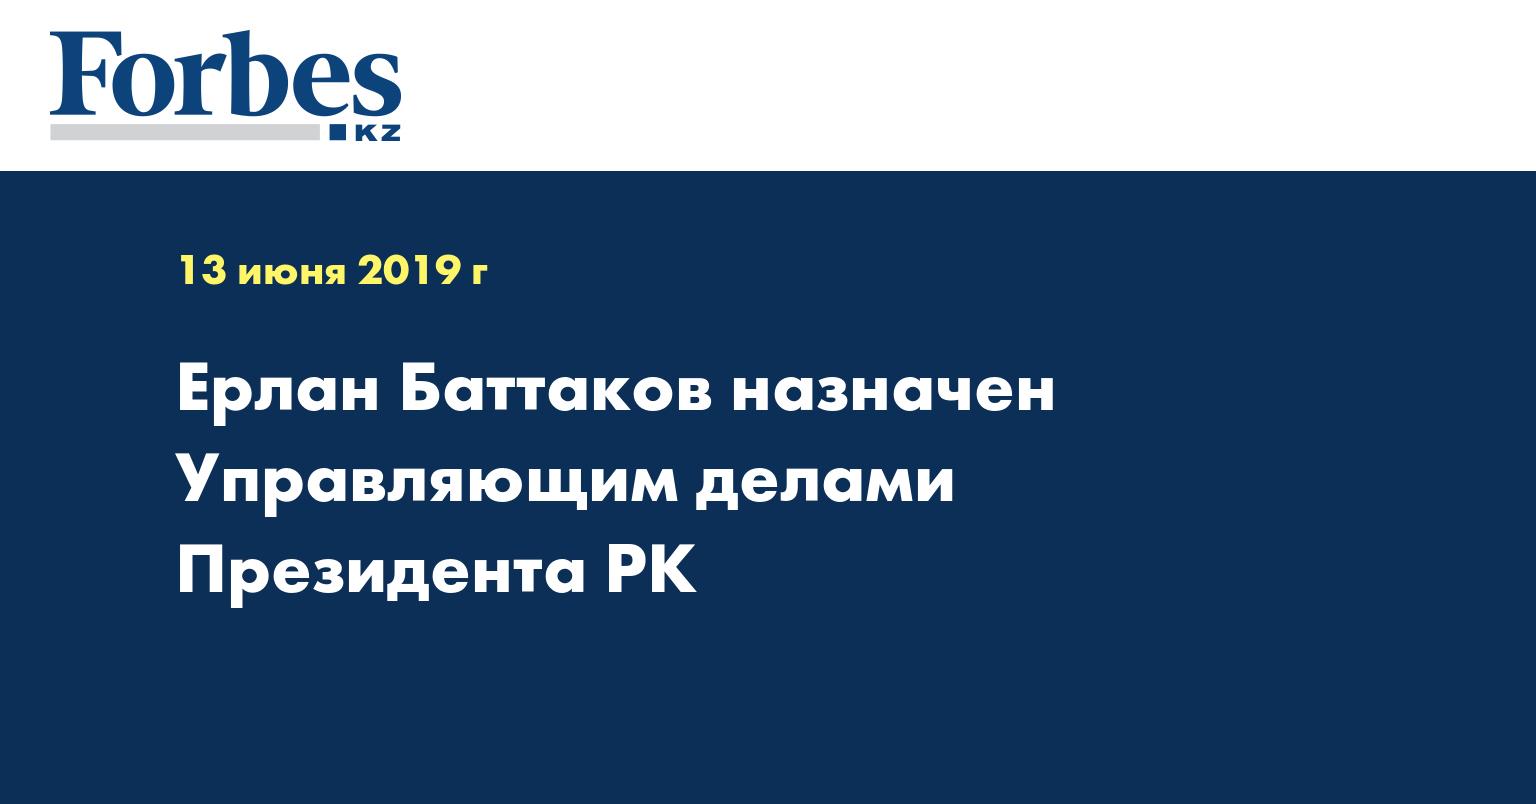 Ерлан Баттаков назначен Управляющим делами Президента РК